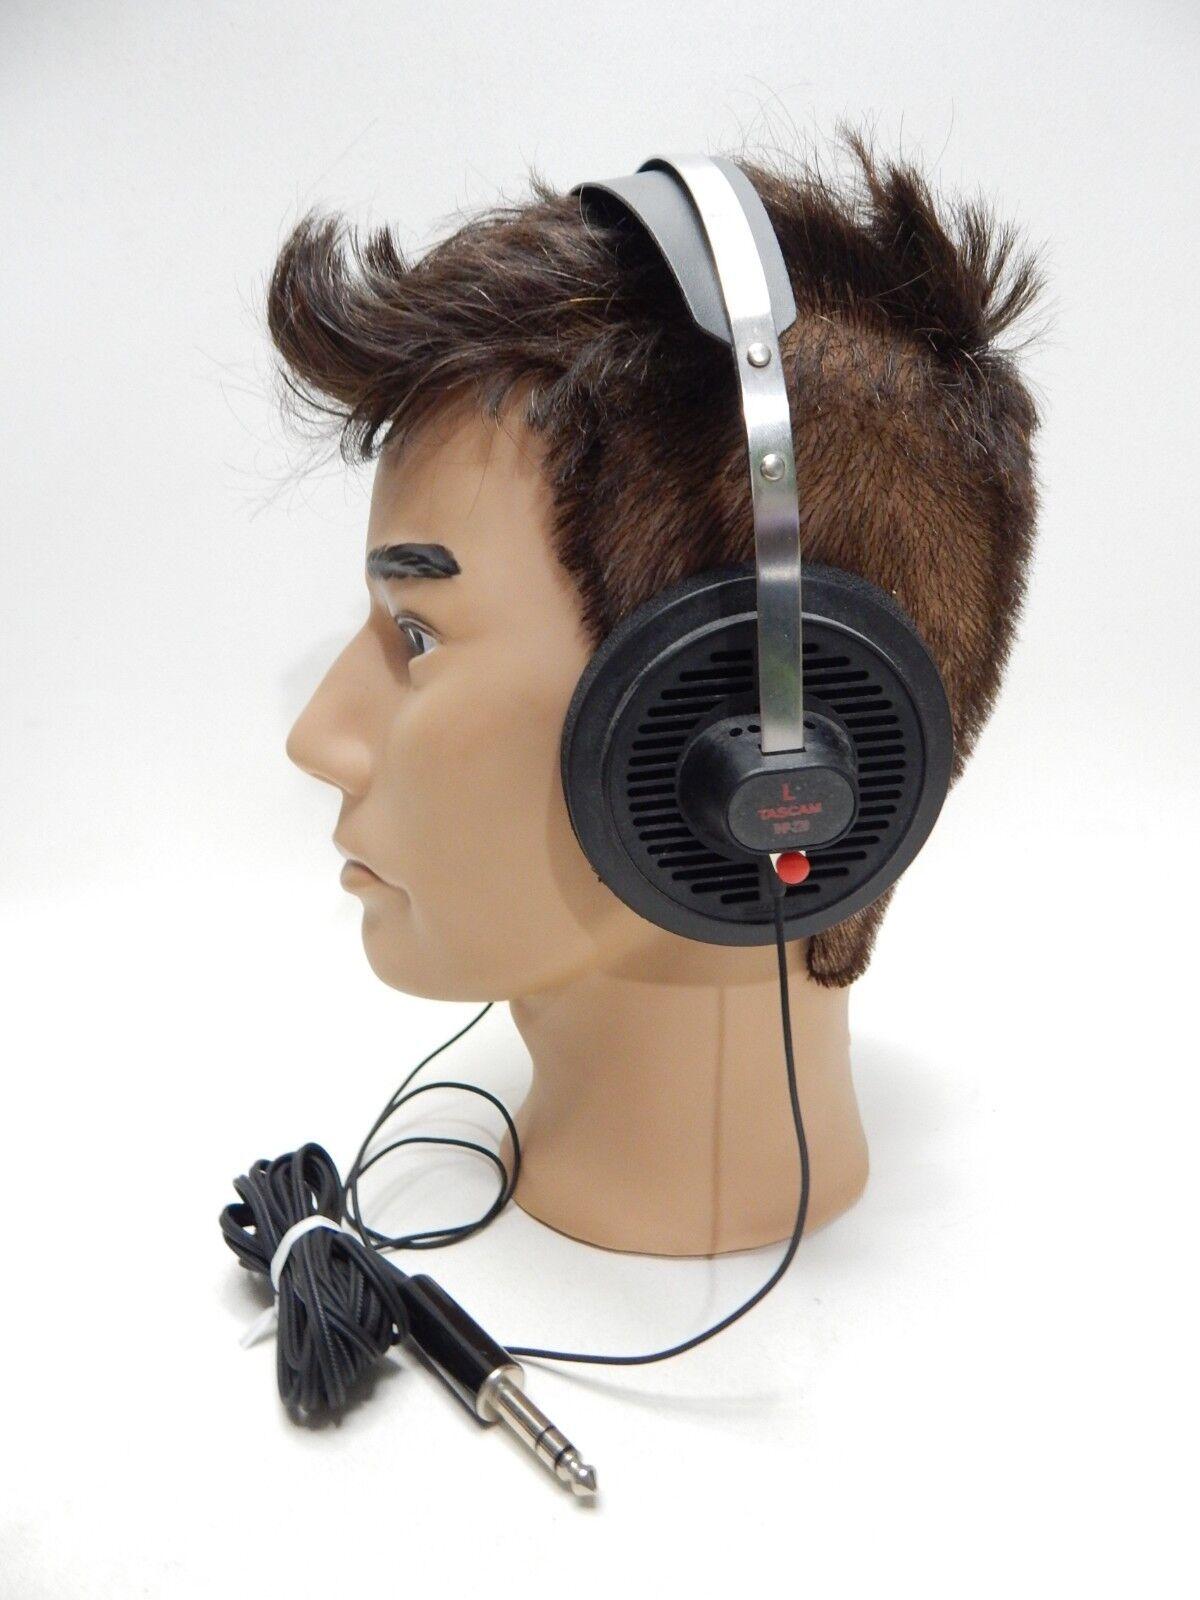 THP-220 Tascam Deluxe Open Air Recording Stereo Headphones VHTF  1 4  Phone Plug